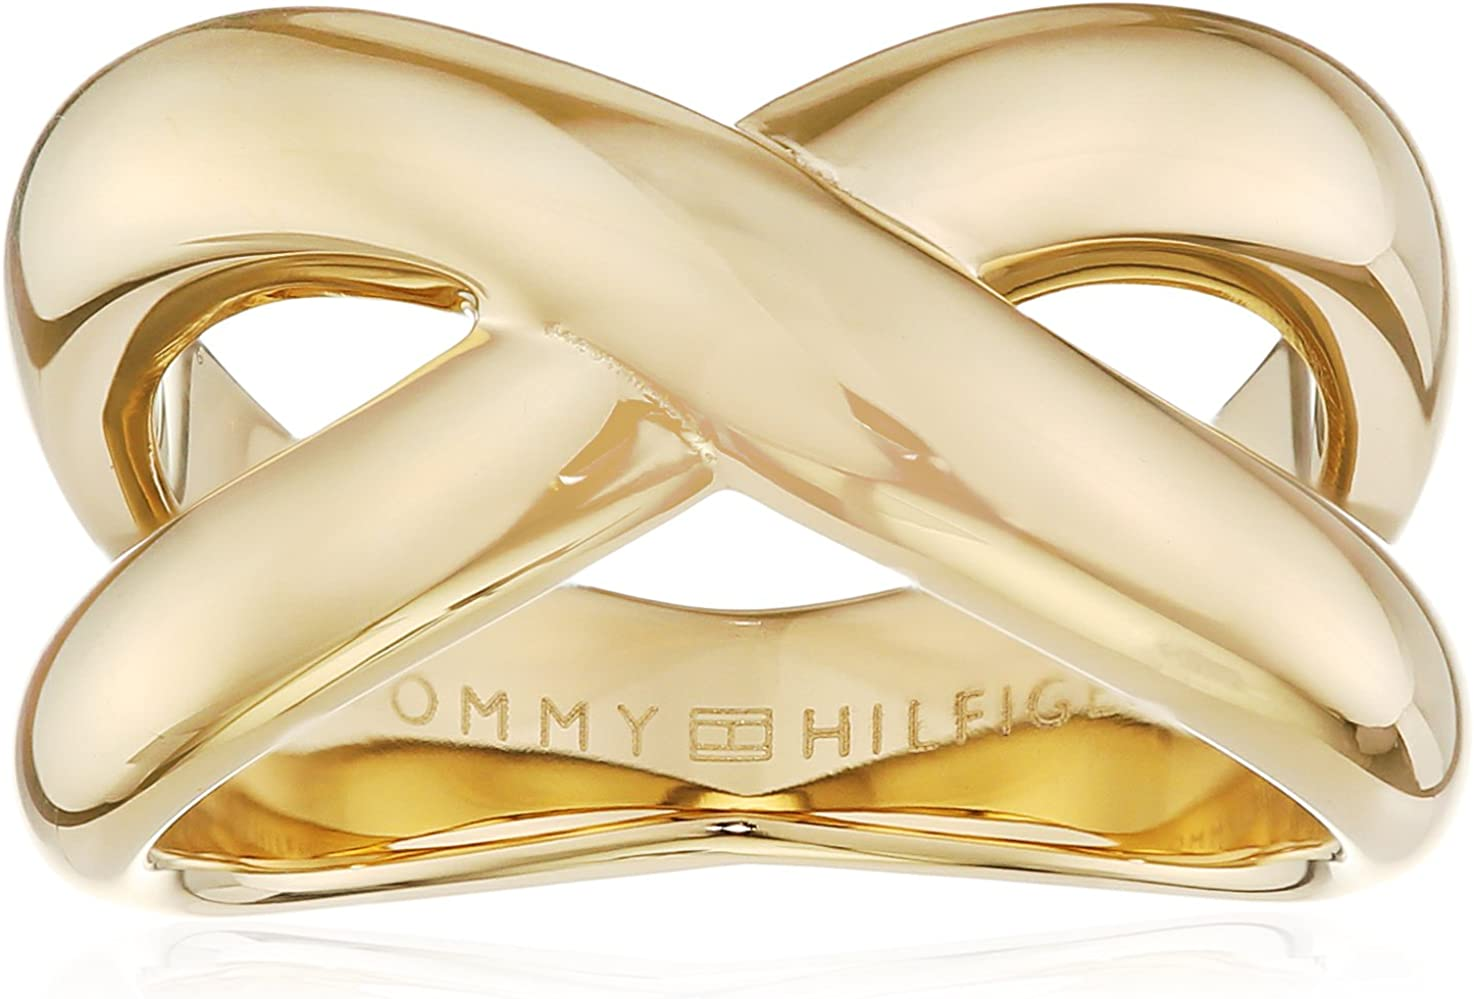 Tommy Hilfiger Jewelry Classic Signature 2700964C - Anillo para mujer (acero inoxidable, talla 54)